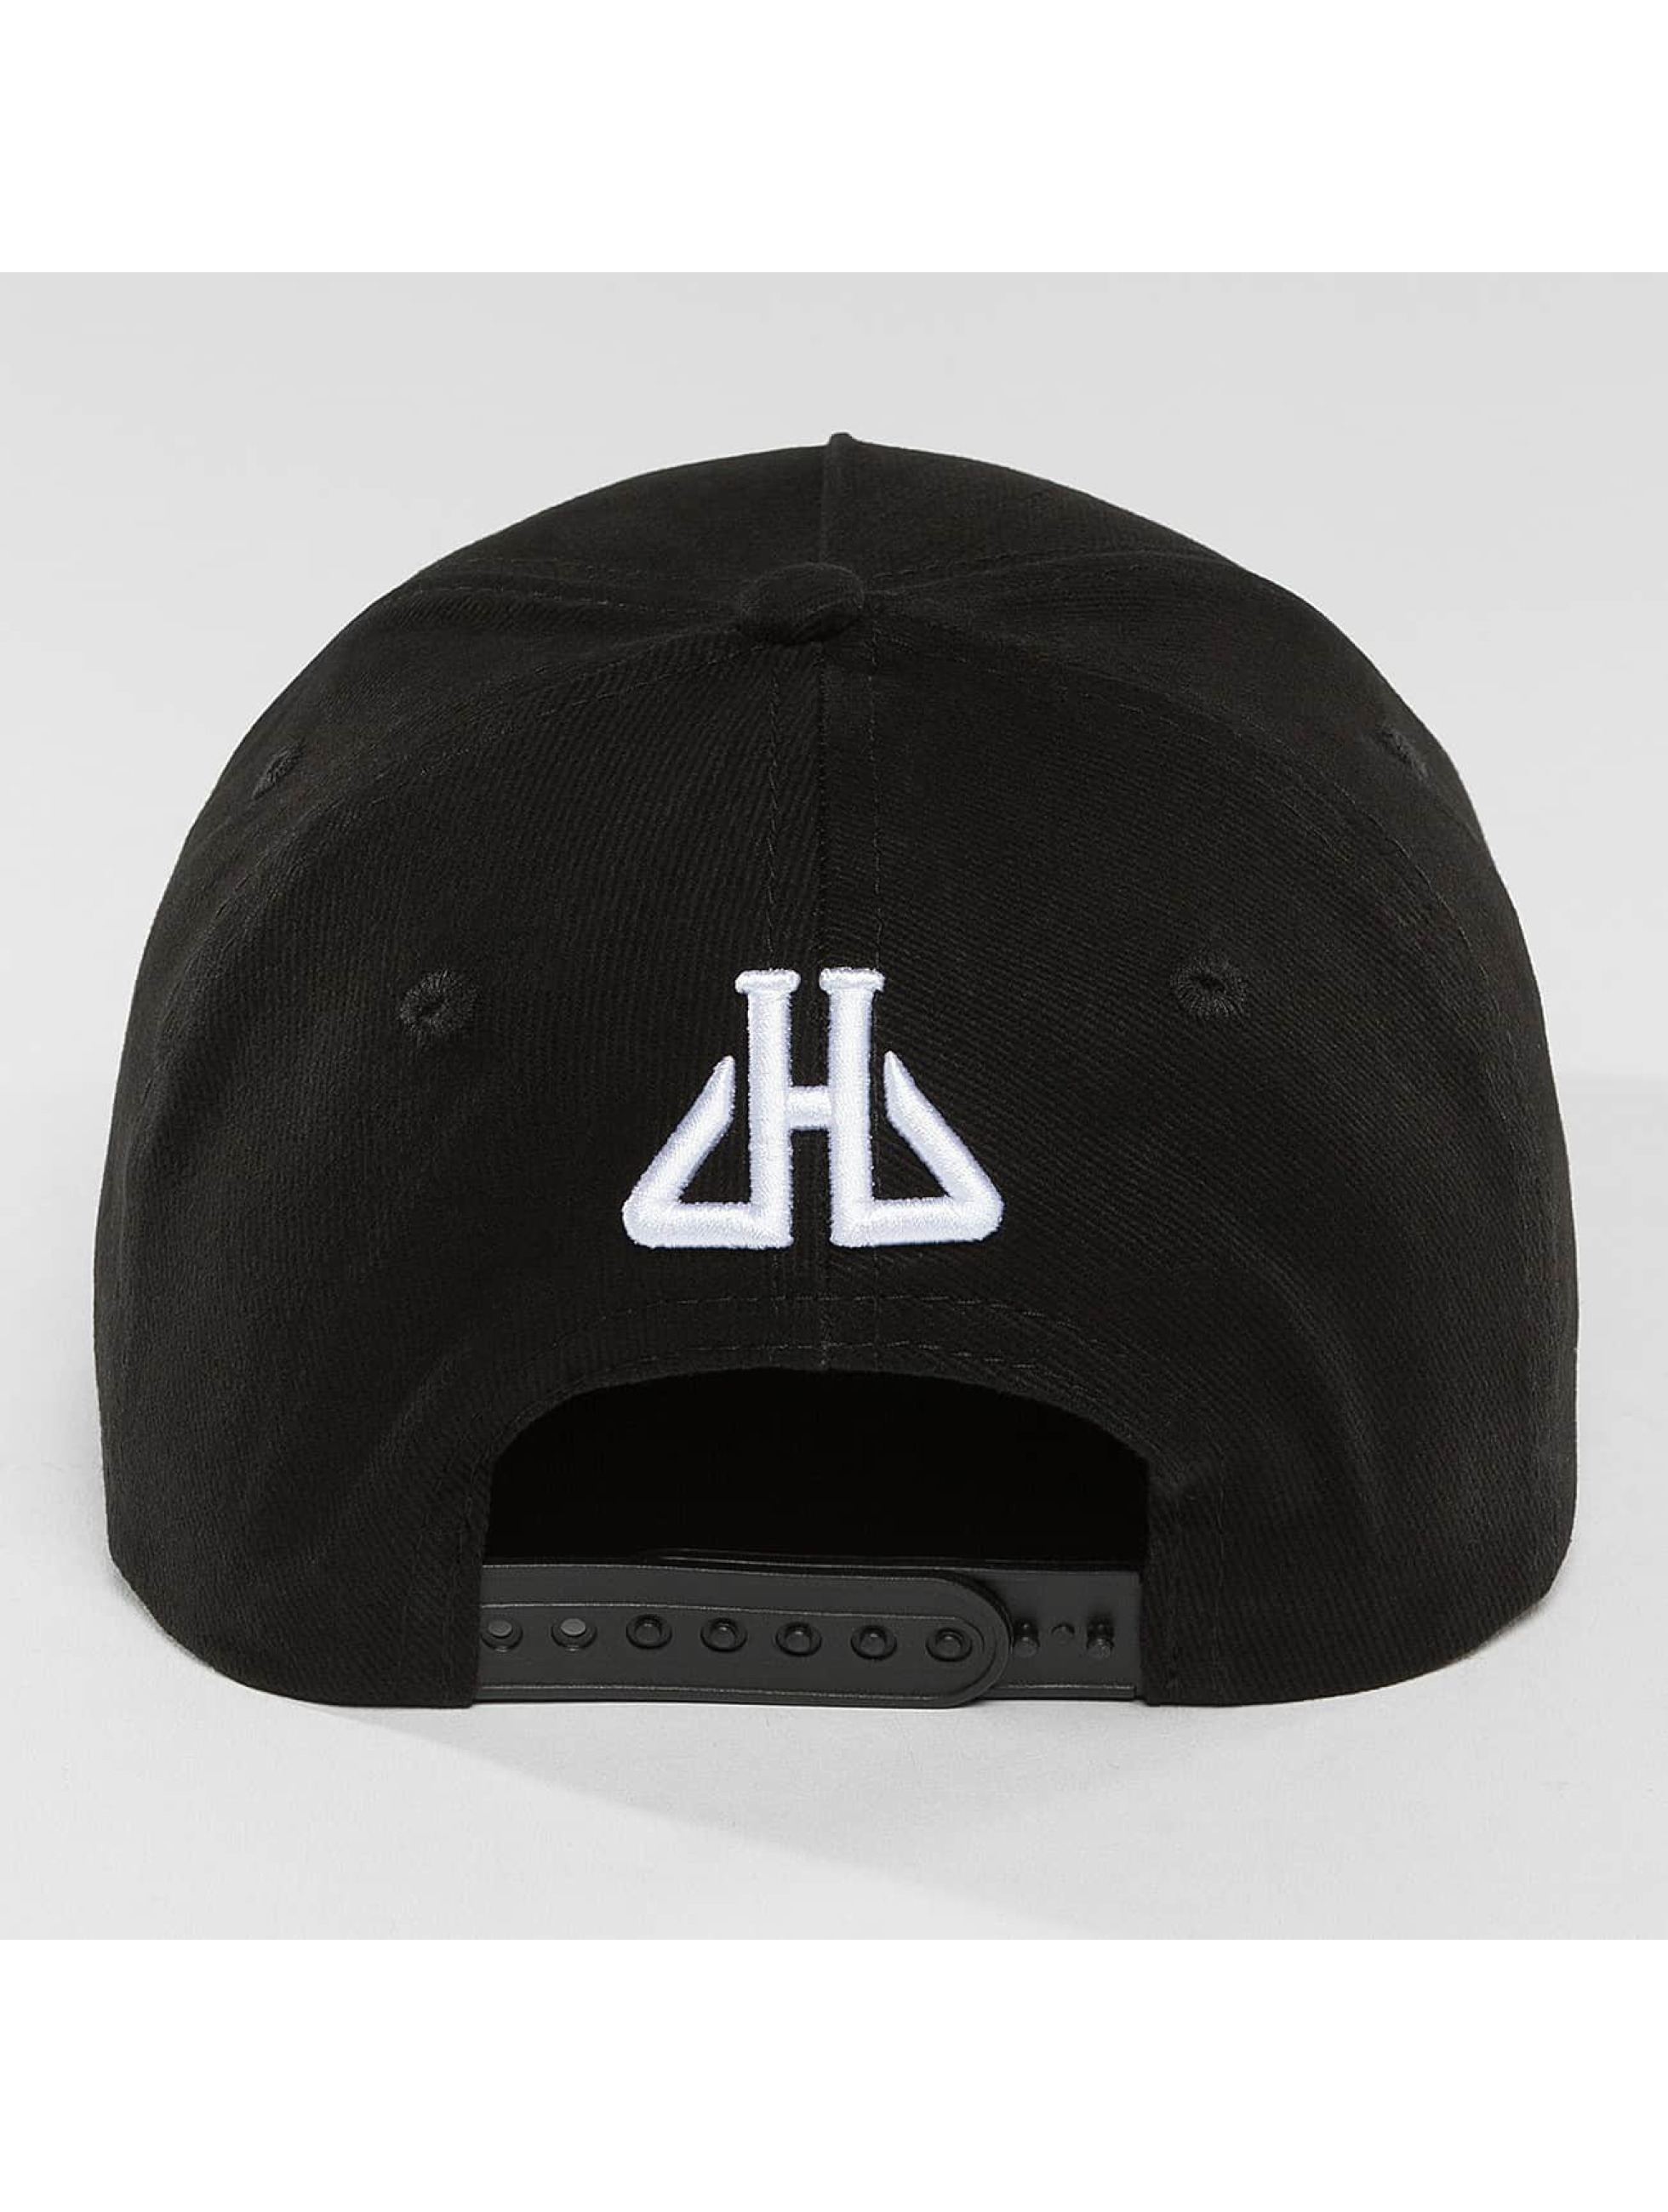 Horspist Snapback Cap Remenber black